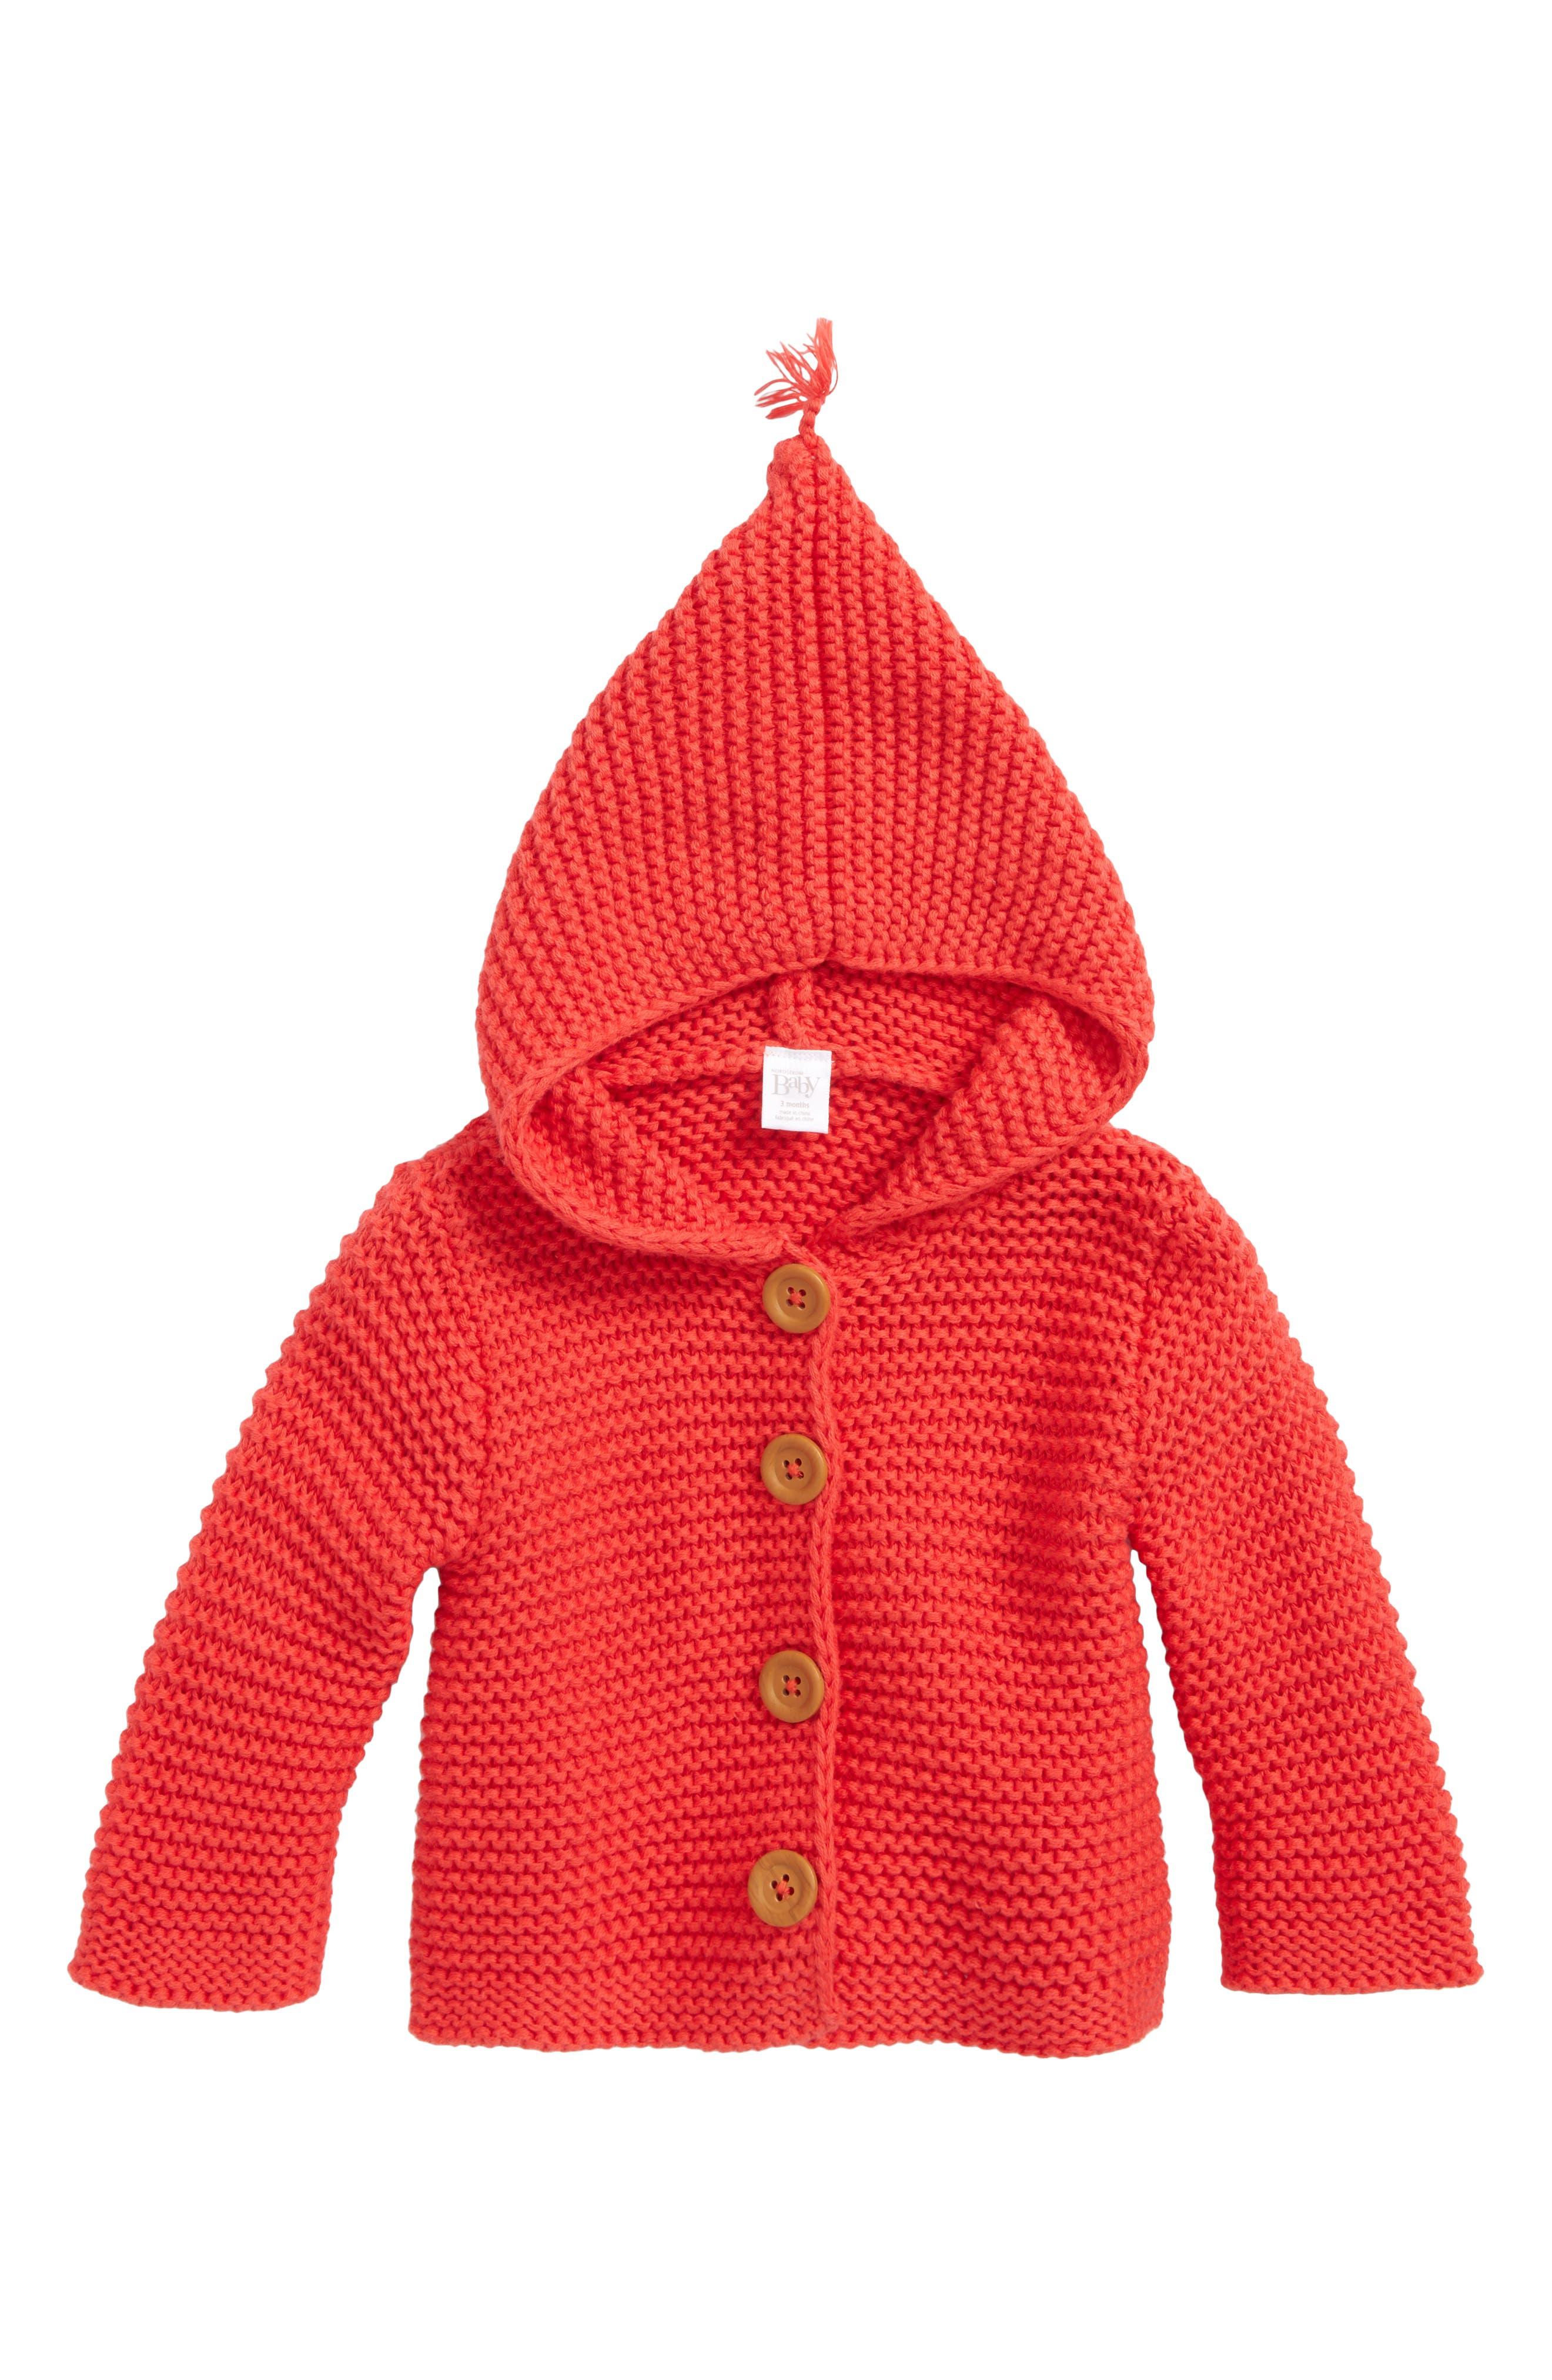 Lofty Organic Cotton Hooded Cardigan,                             Main thumbnail 1, color,                             610